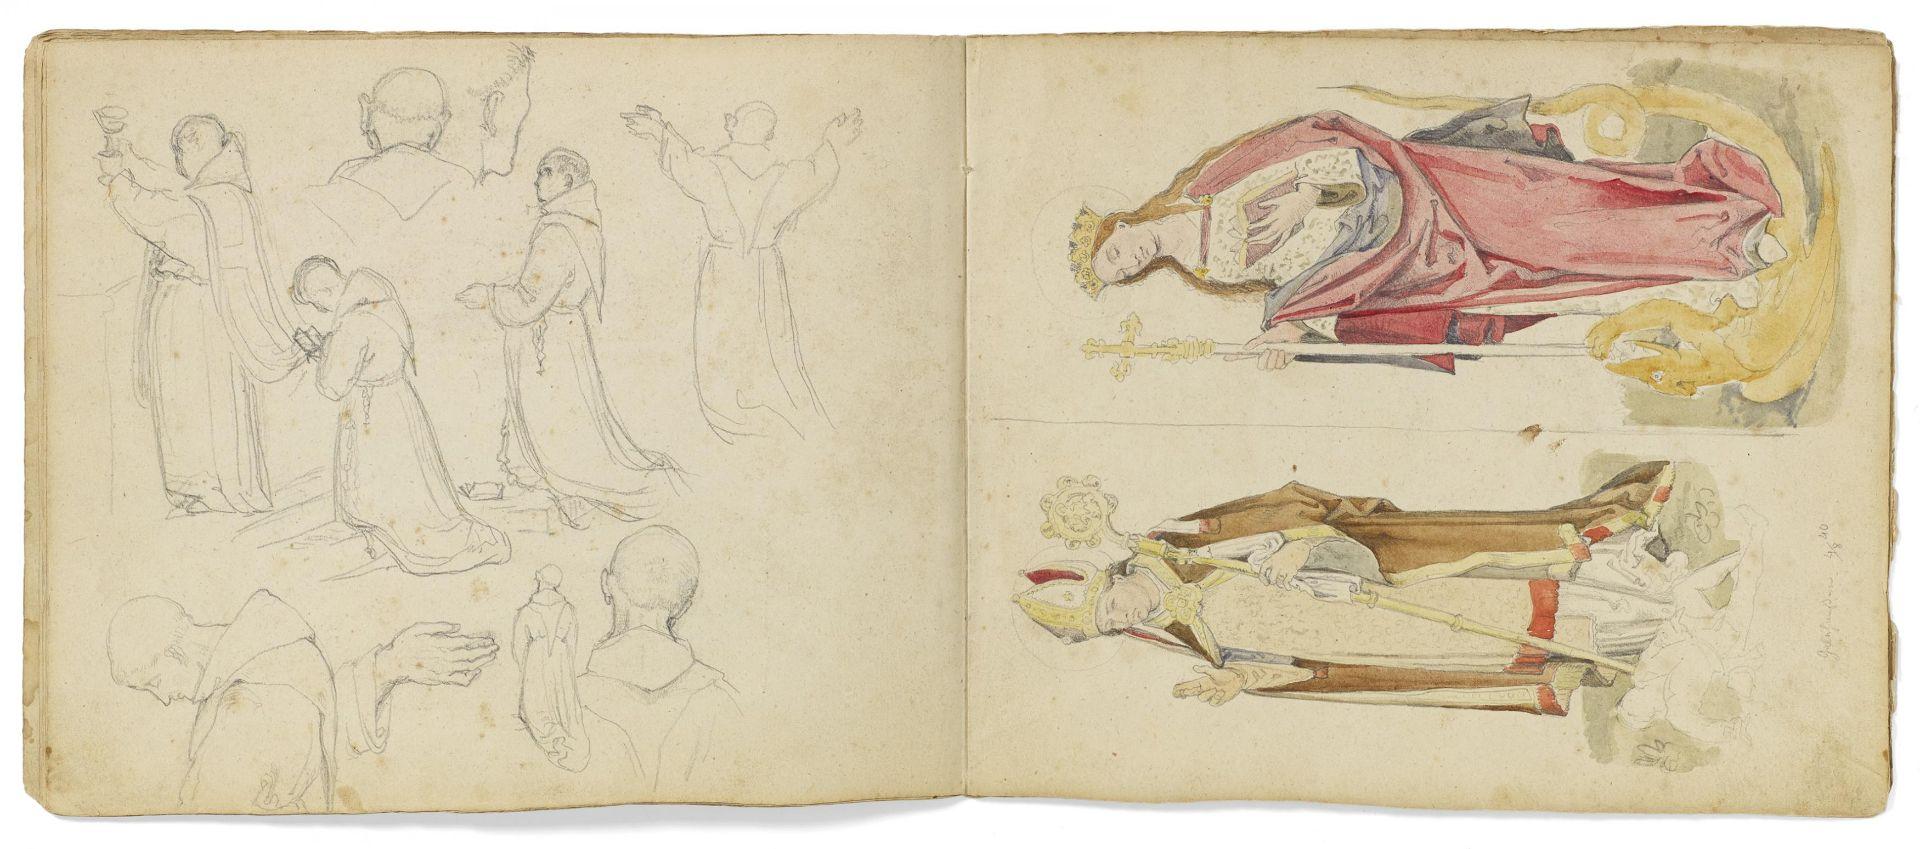 Kaupert, Gustav Kassel 1819 - 1897  Sketchbook, two booklets, each ca. 17 pages. Architectural - Bild 4 aus 8